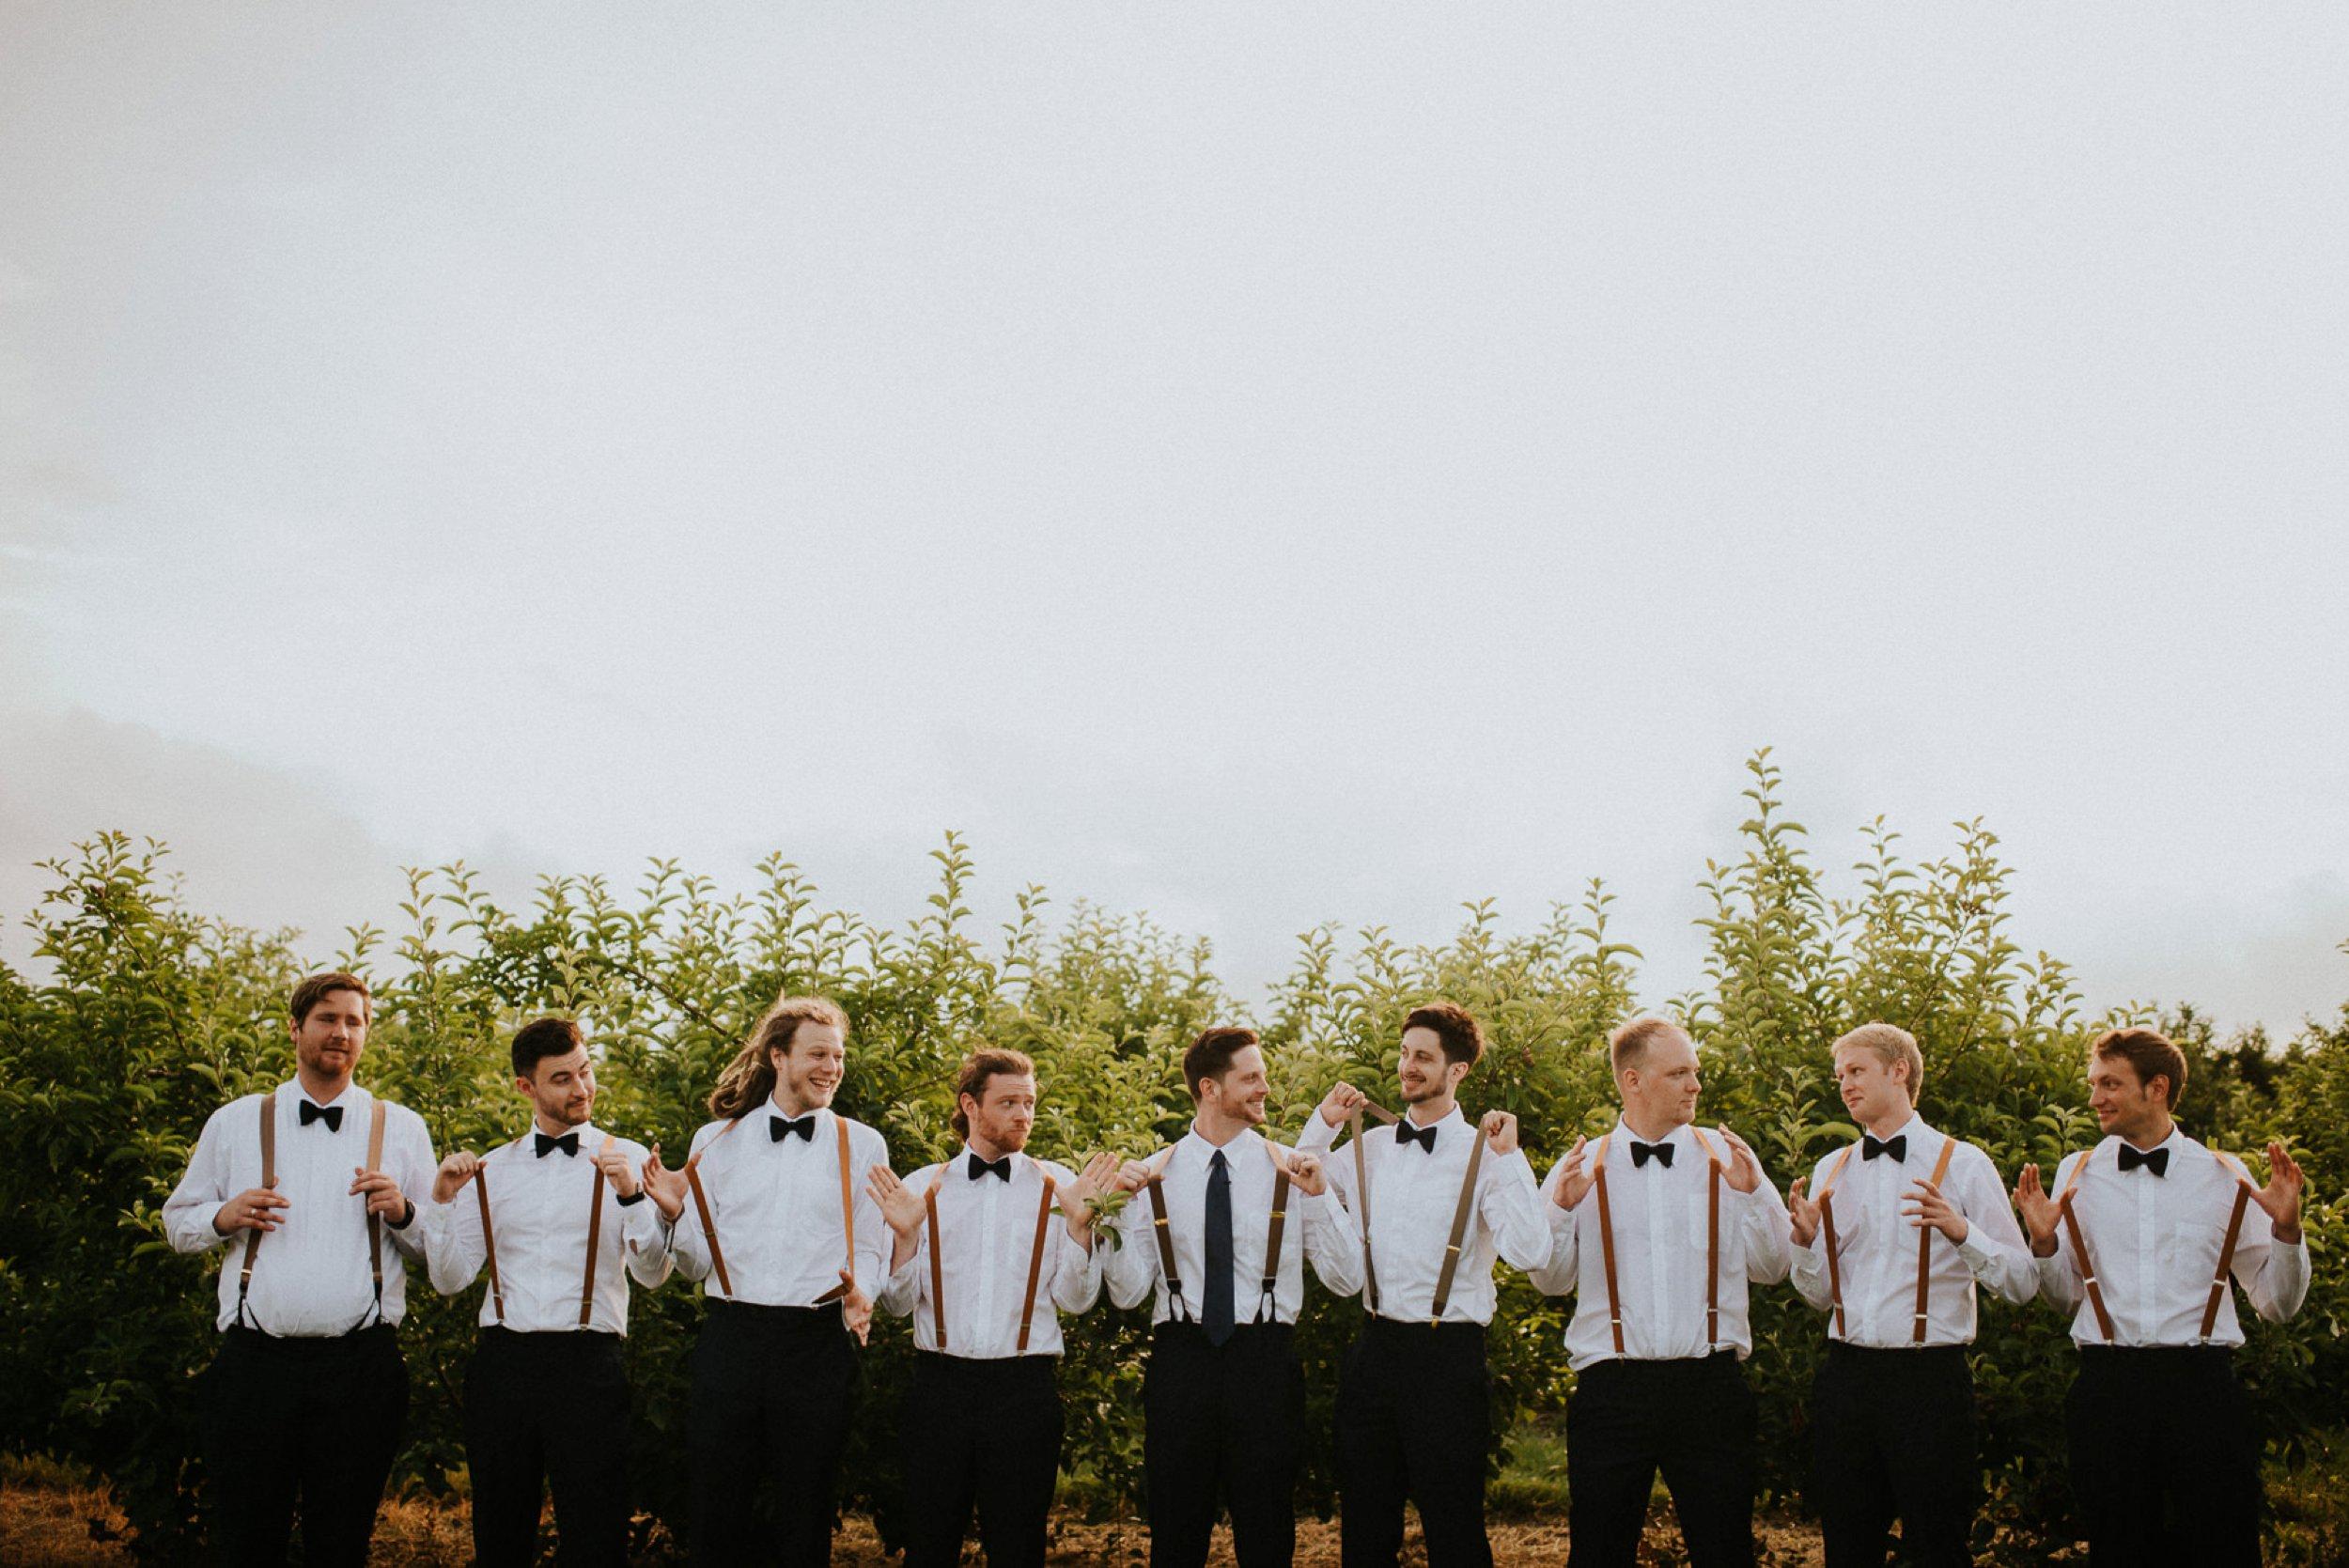 milburn_farms-wedding-62.jpg